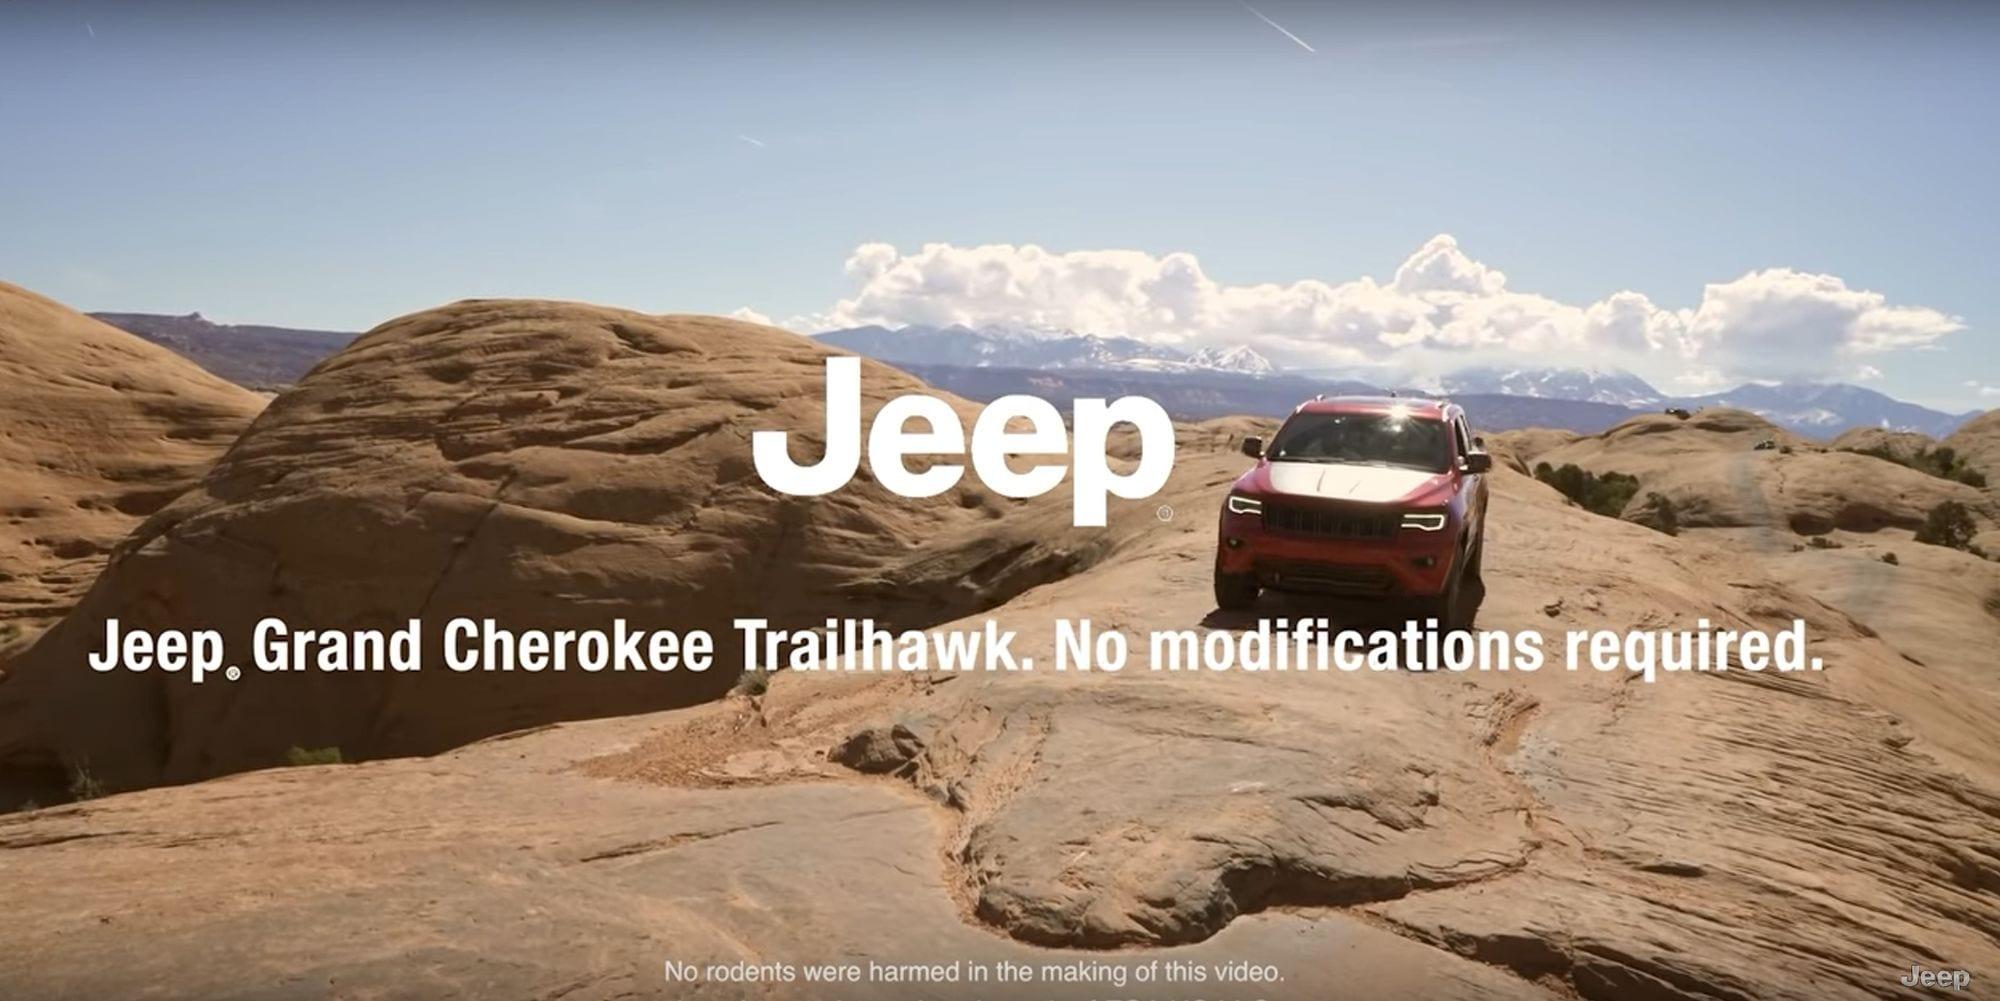 Kia tried Moab. Jeep trolled on through